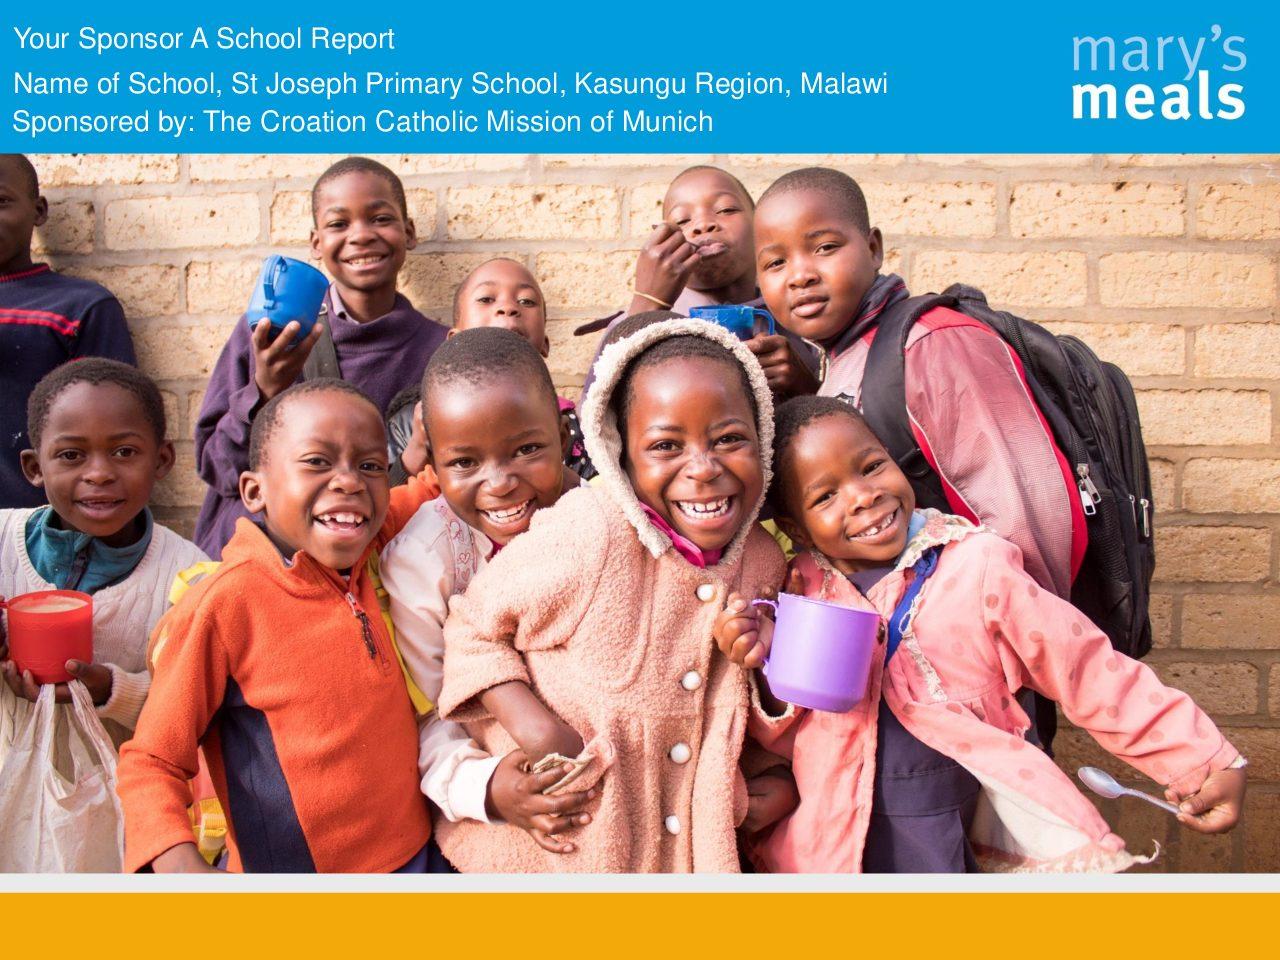 https://hkz-muenchen.de/wp-content/uploads/2020/02/2019-SAS-Report-St-Joseph-Primary-School-Malawi-pdf.jpg